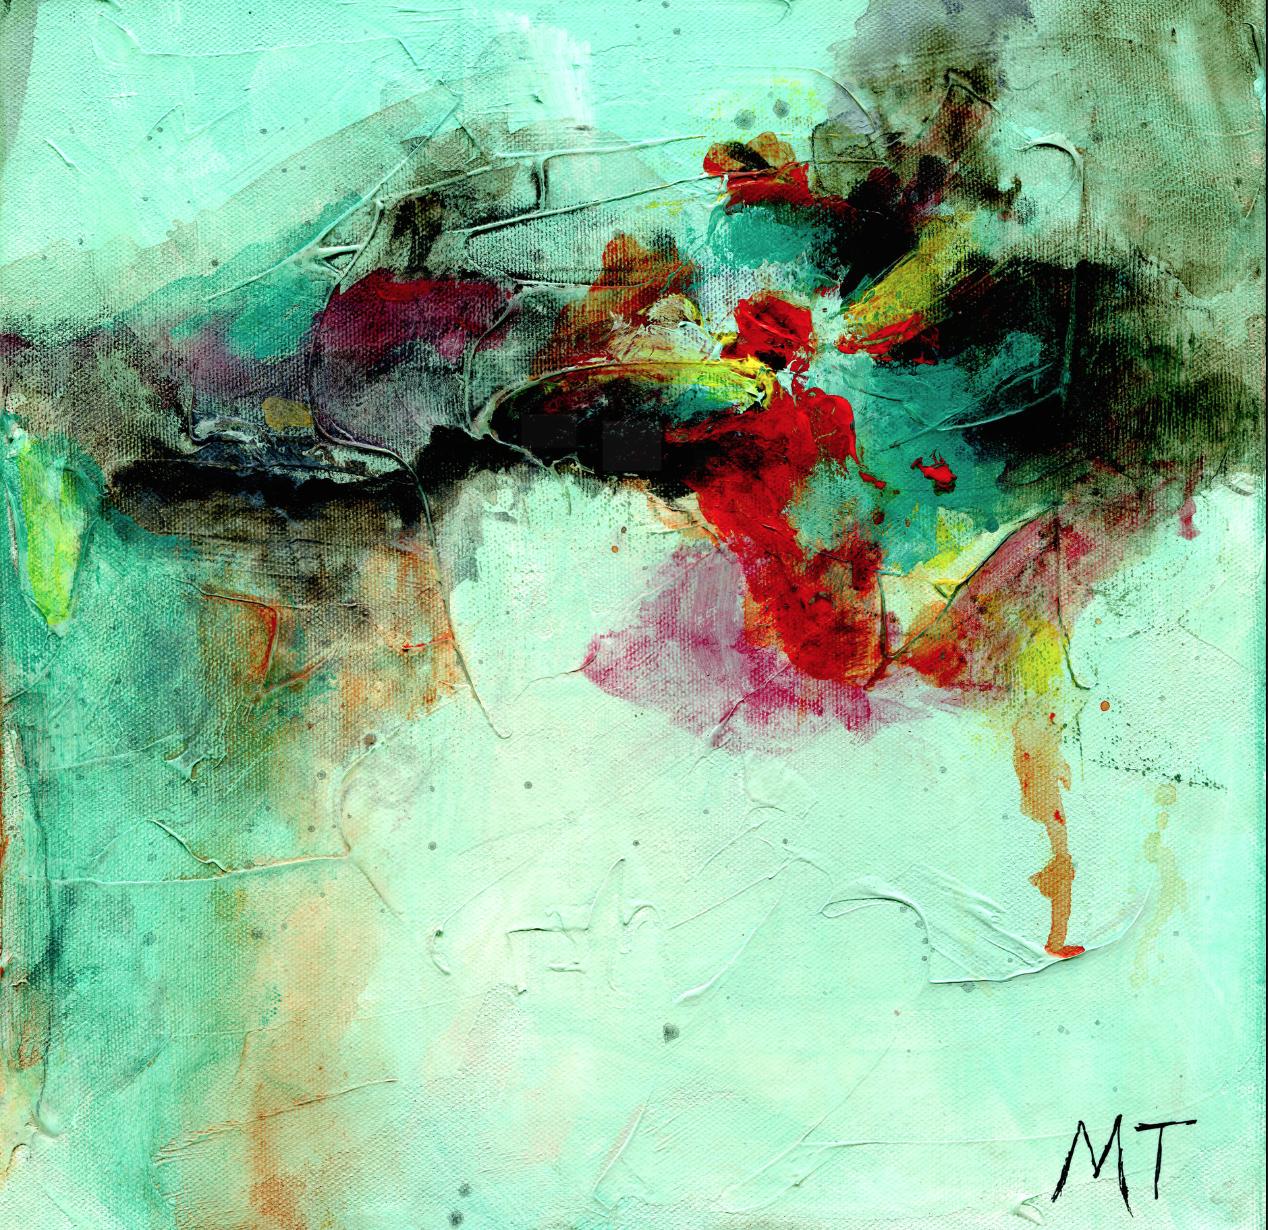 Splash, 2015 (SOLD)